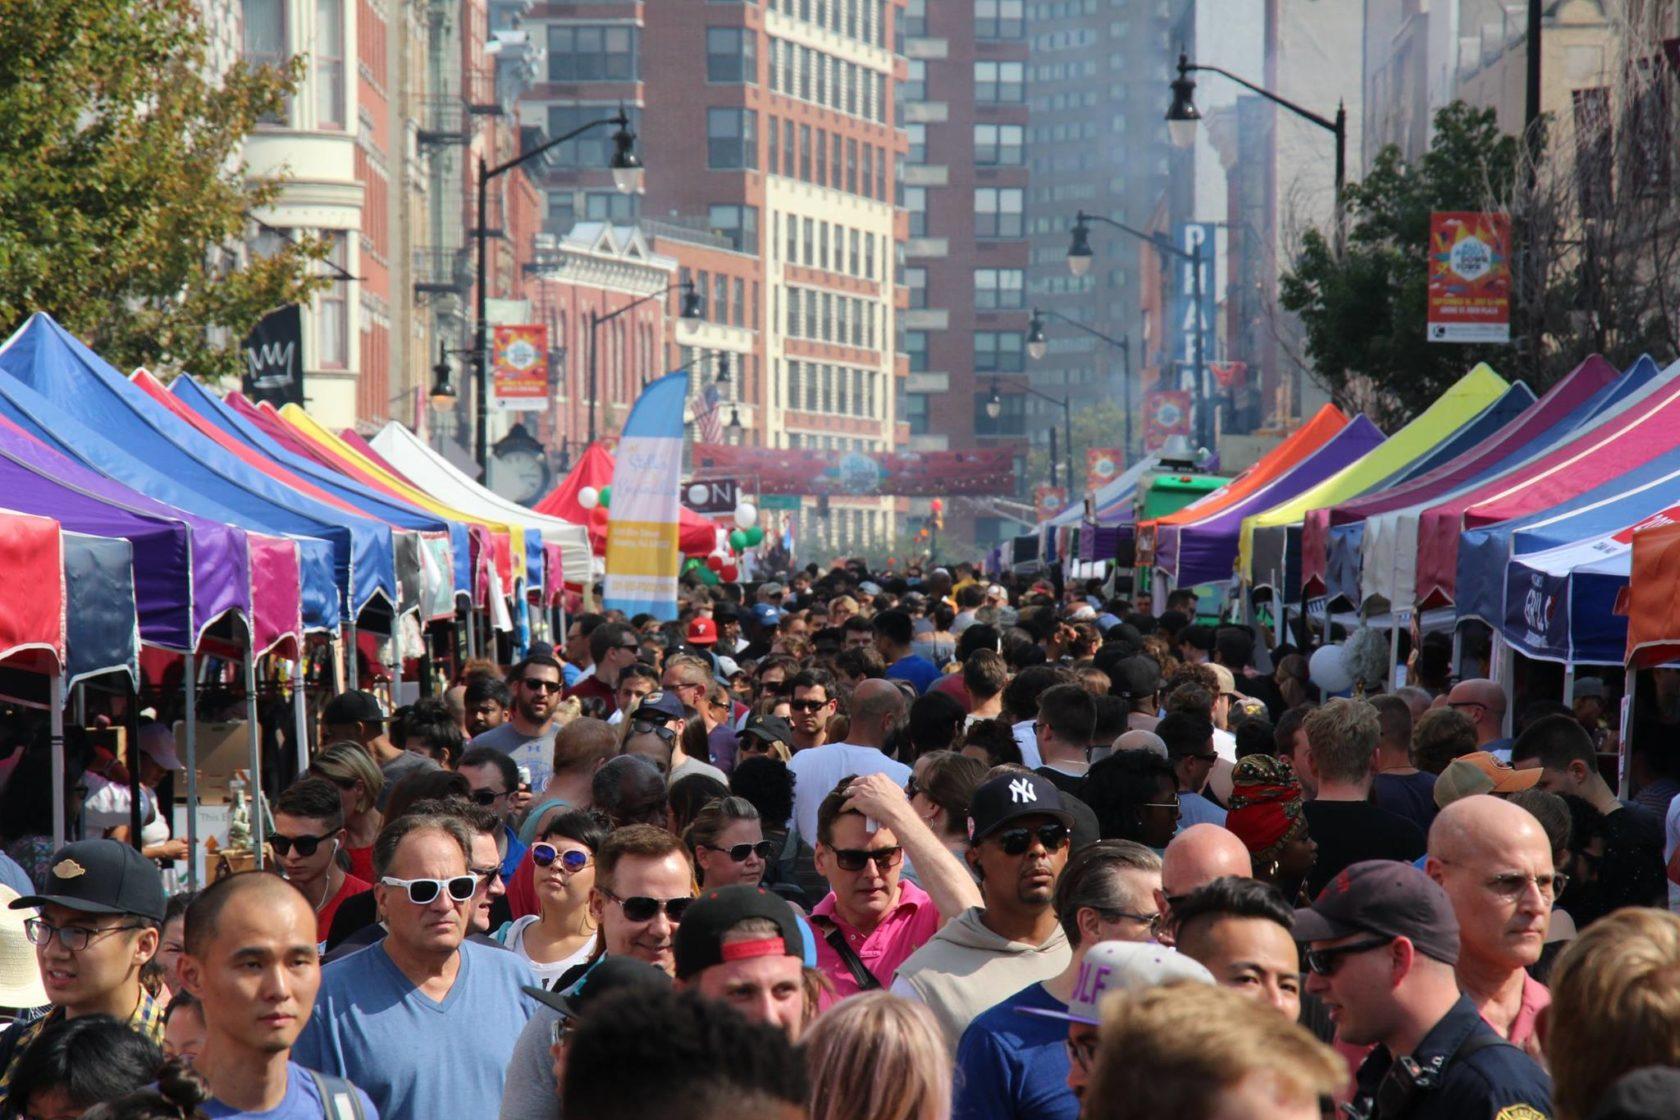 ChicpeaJC Takes Over HDSID Instagram for Street Fair